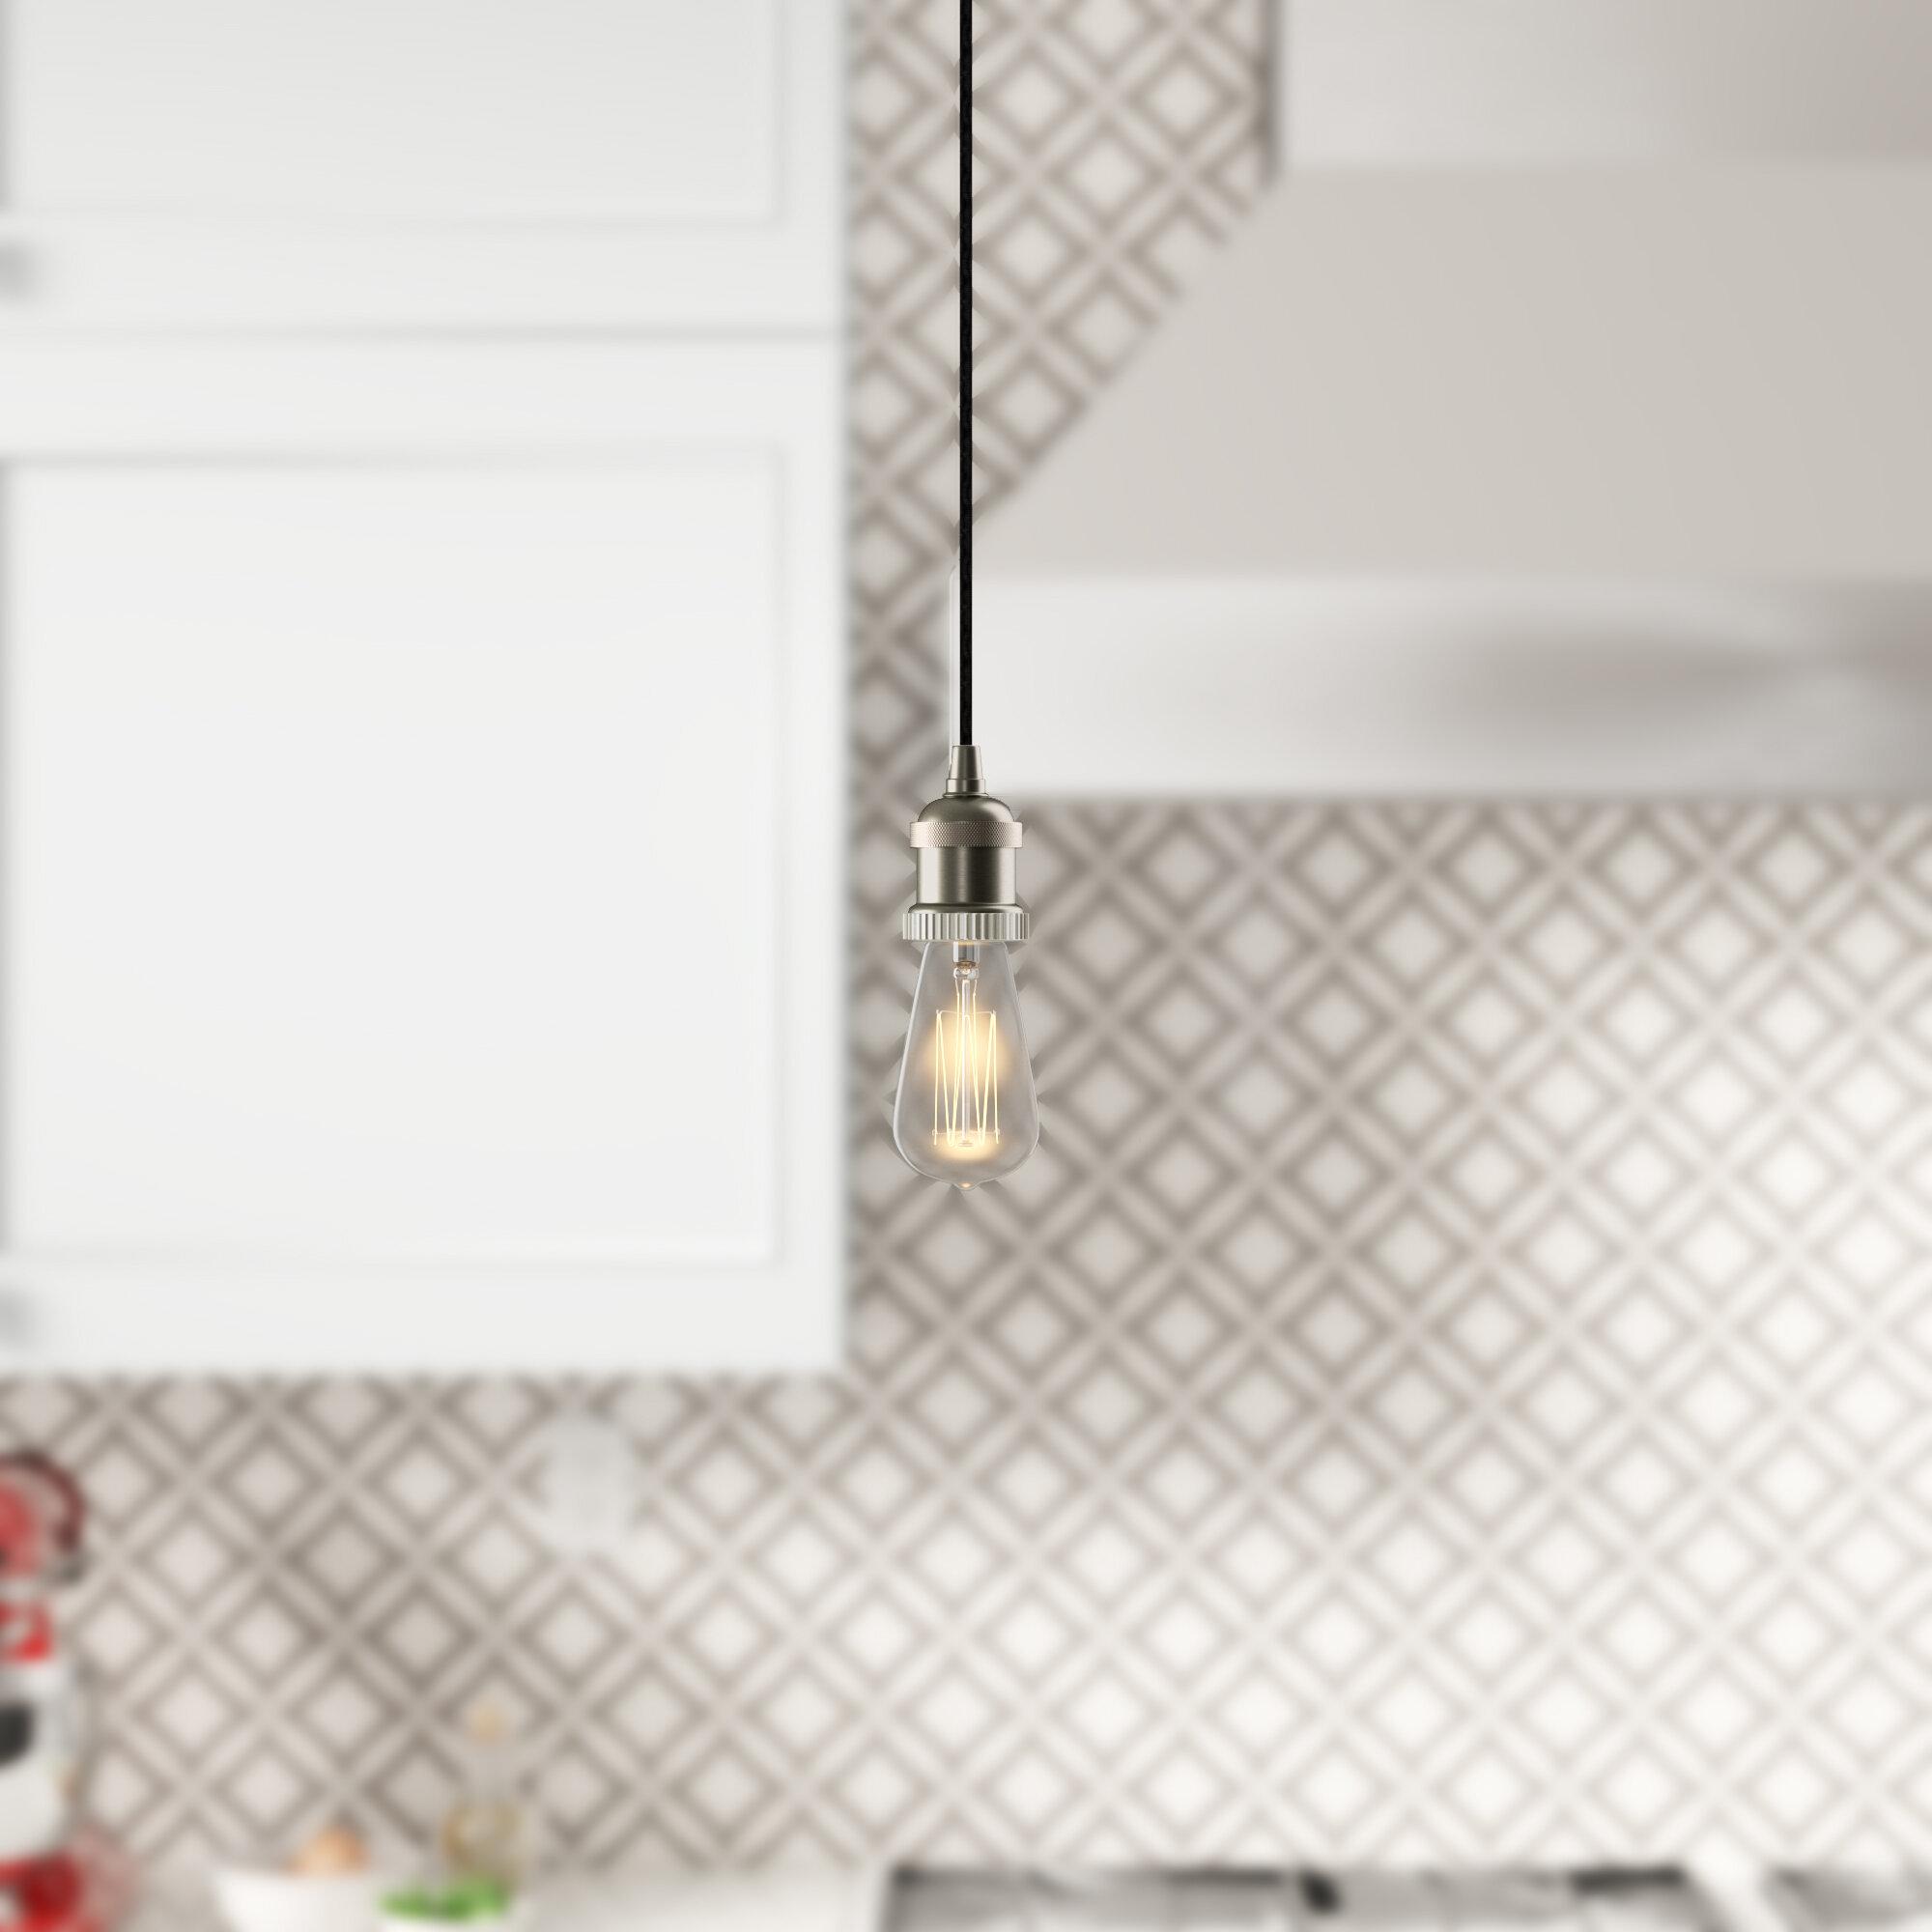 Williston Forge Mignone 1 Light Single Bulb Pendant Reviews Wayfair